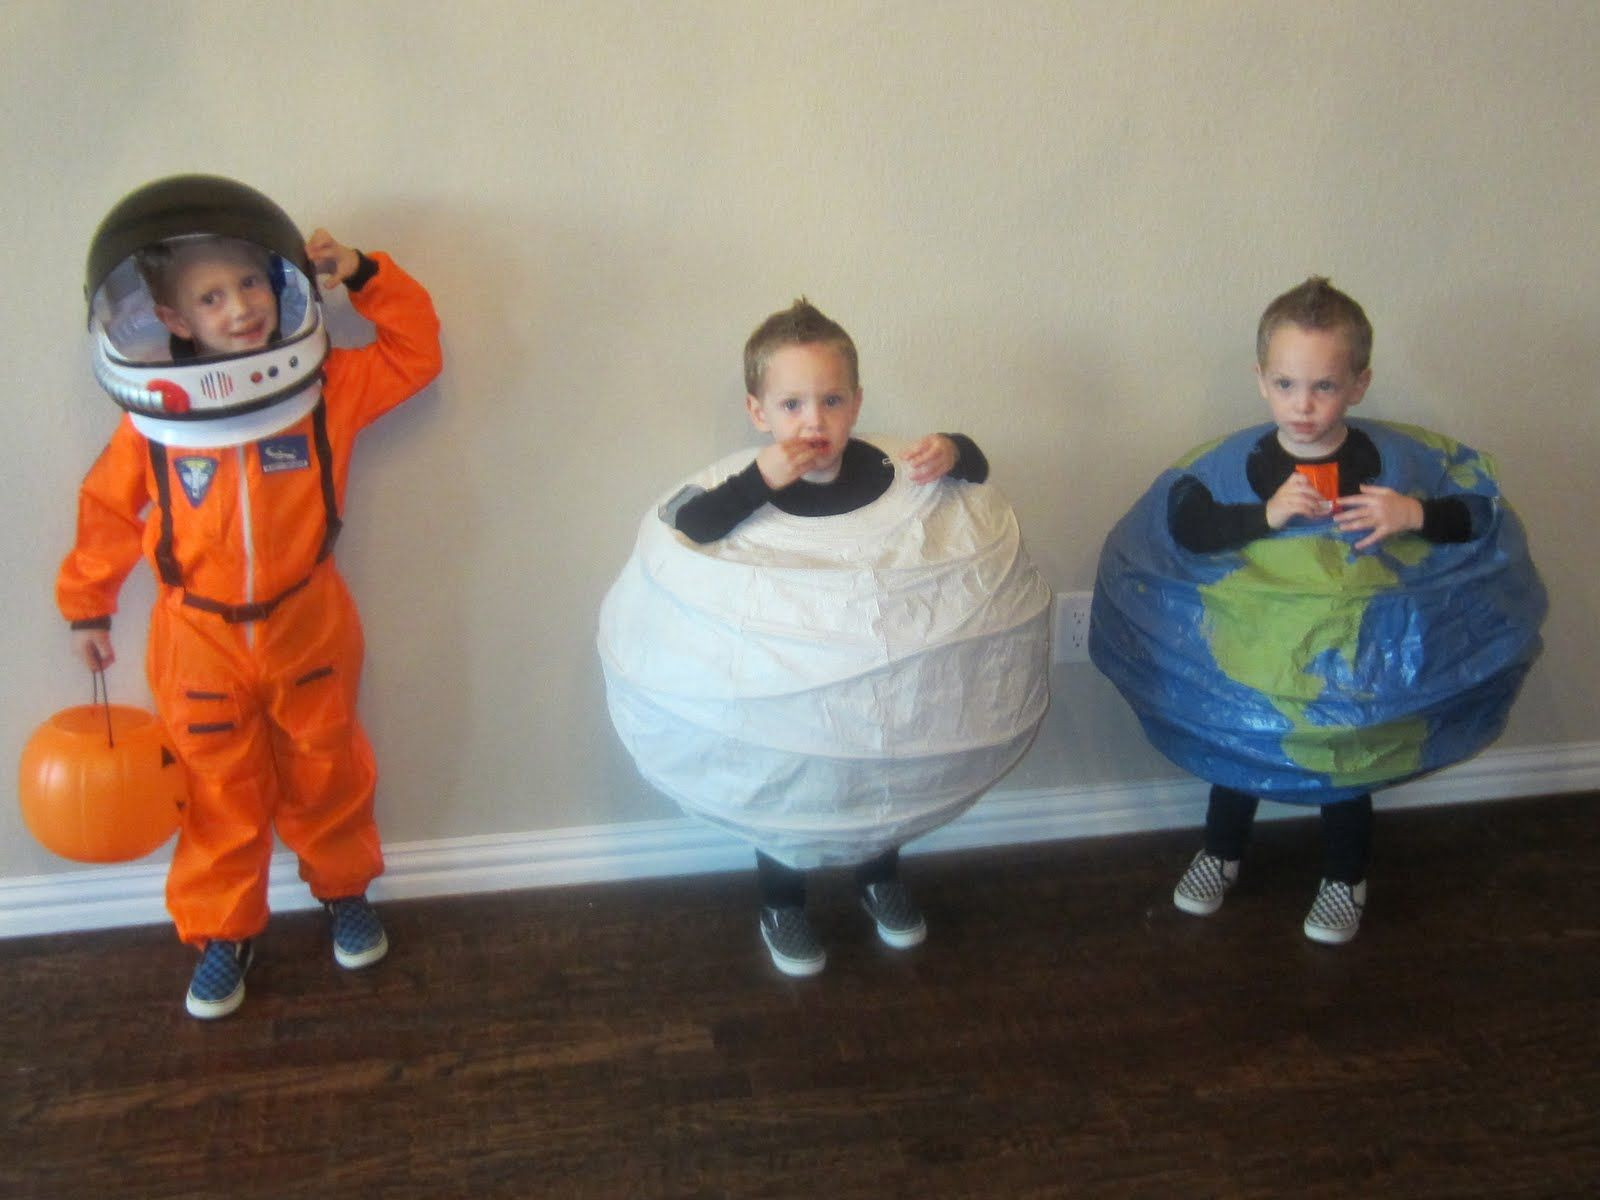 pluto planet costumes - photo #18